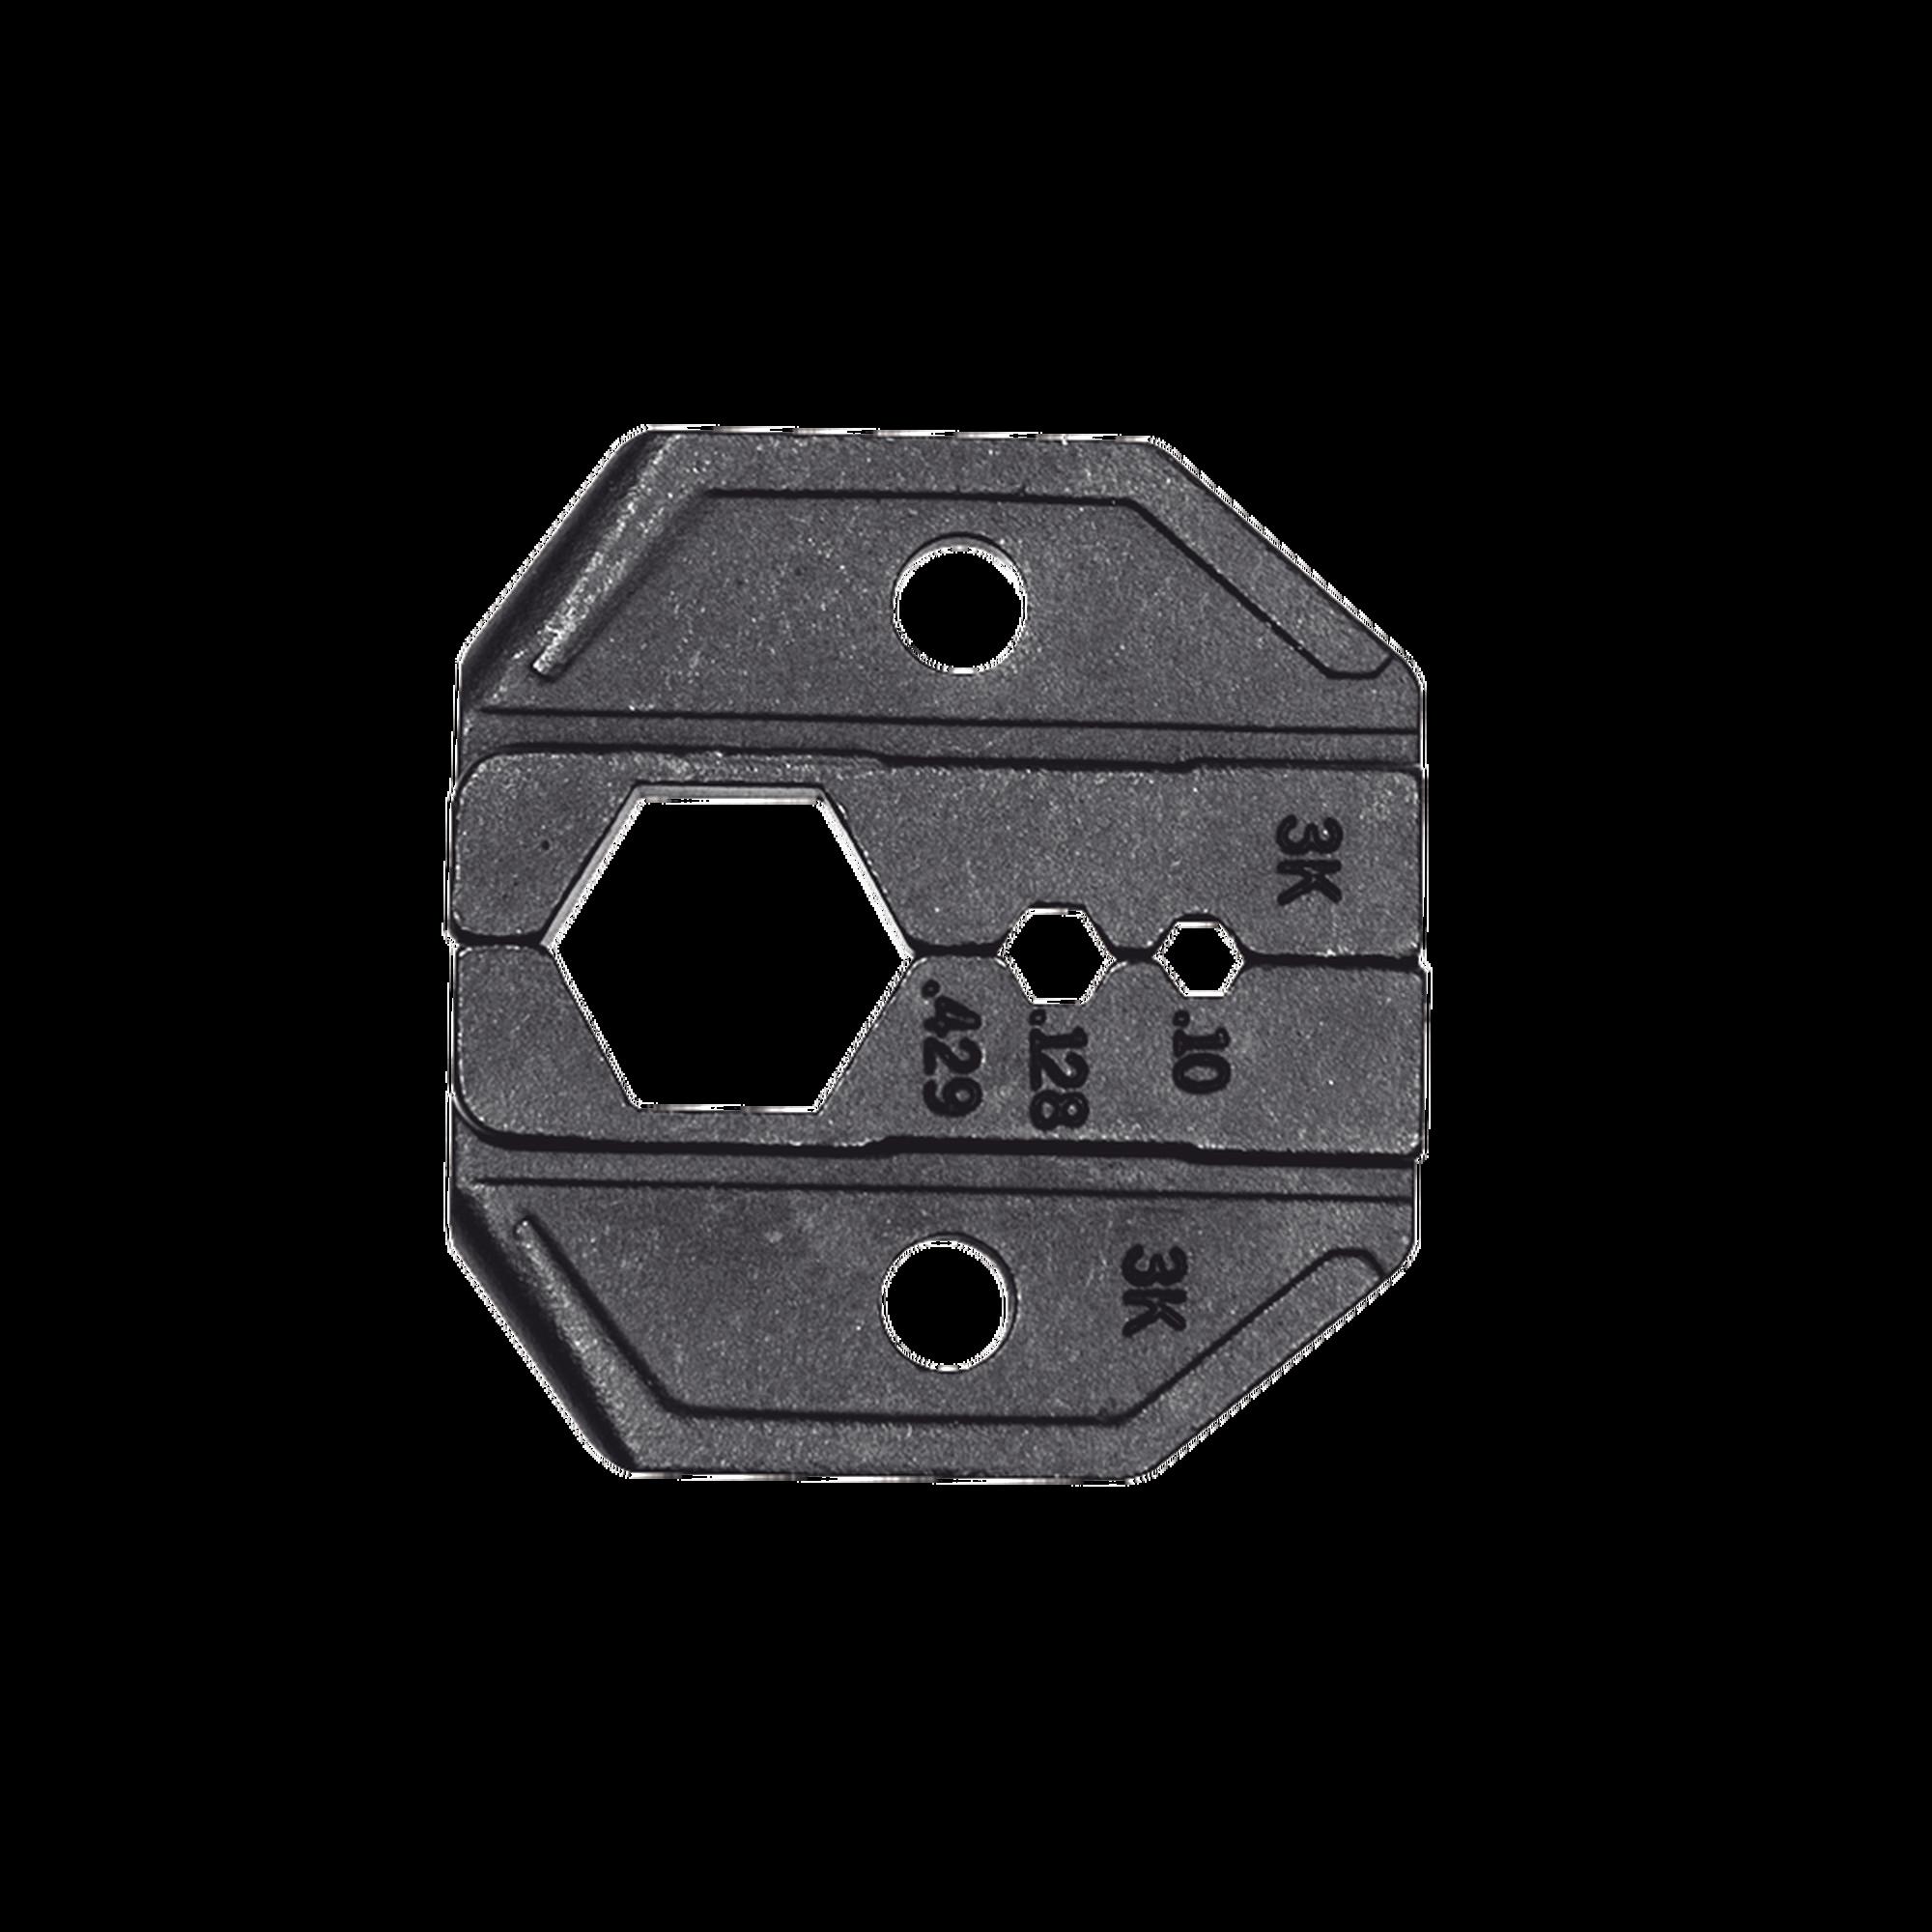 Matriz Ponchadora para Cable coaxial RG8, RG11, RG174, RG179 y RG213.